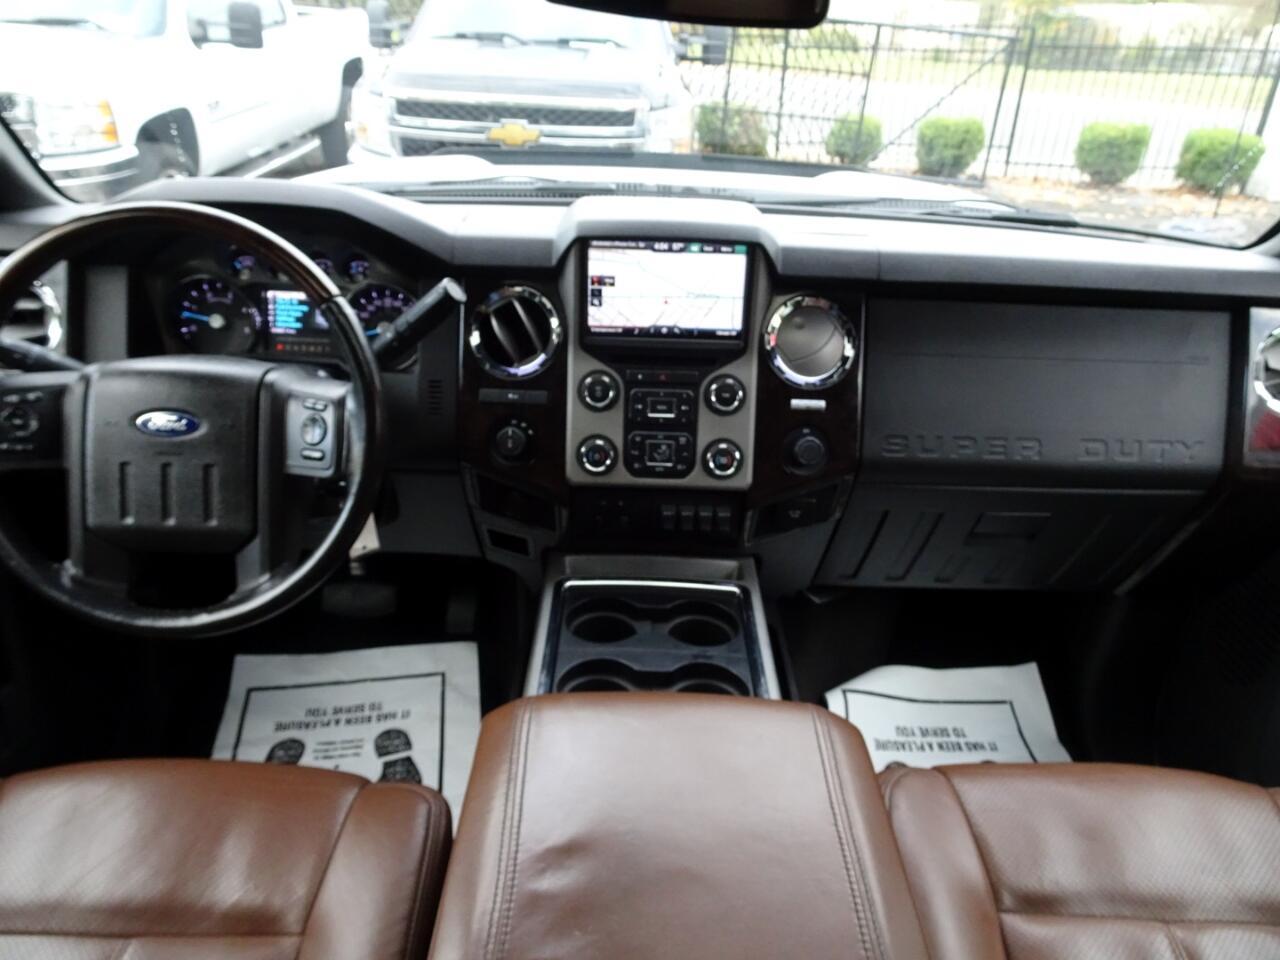 2013 Ford F-250 SD Platinum Supercrew 4WD